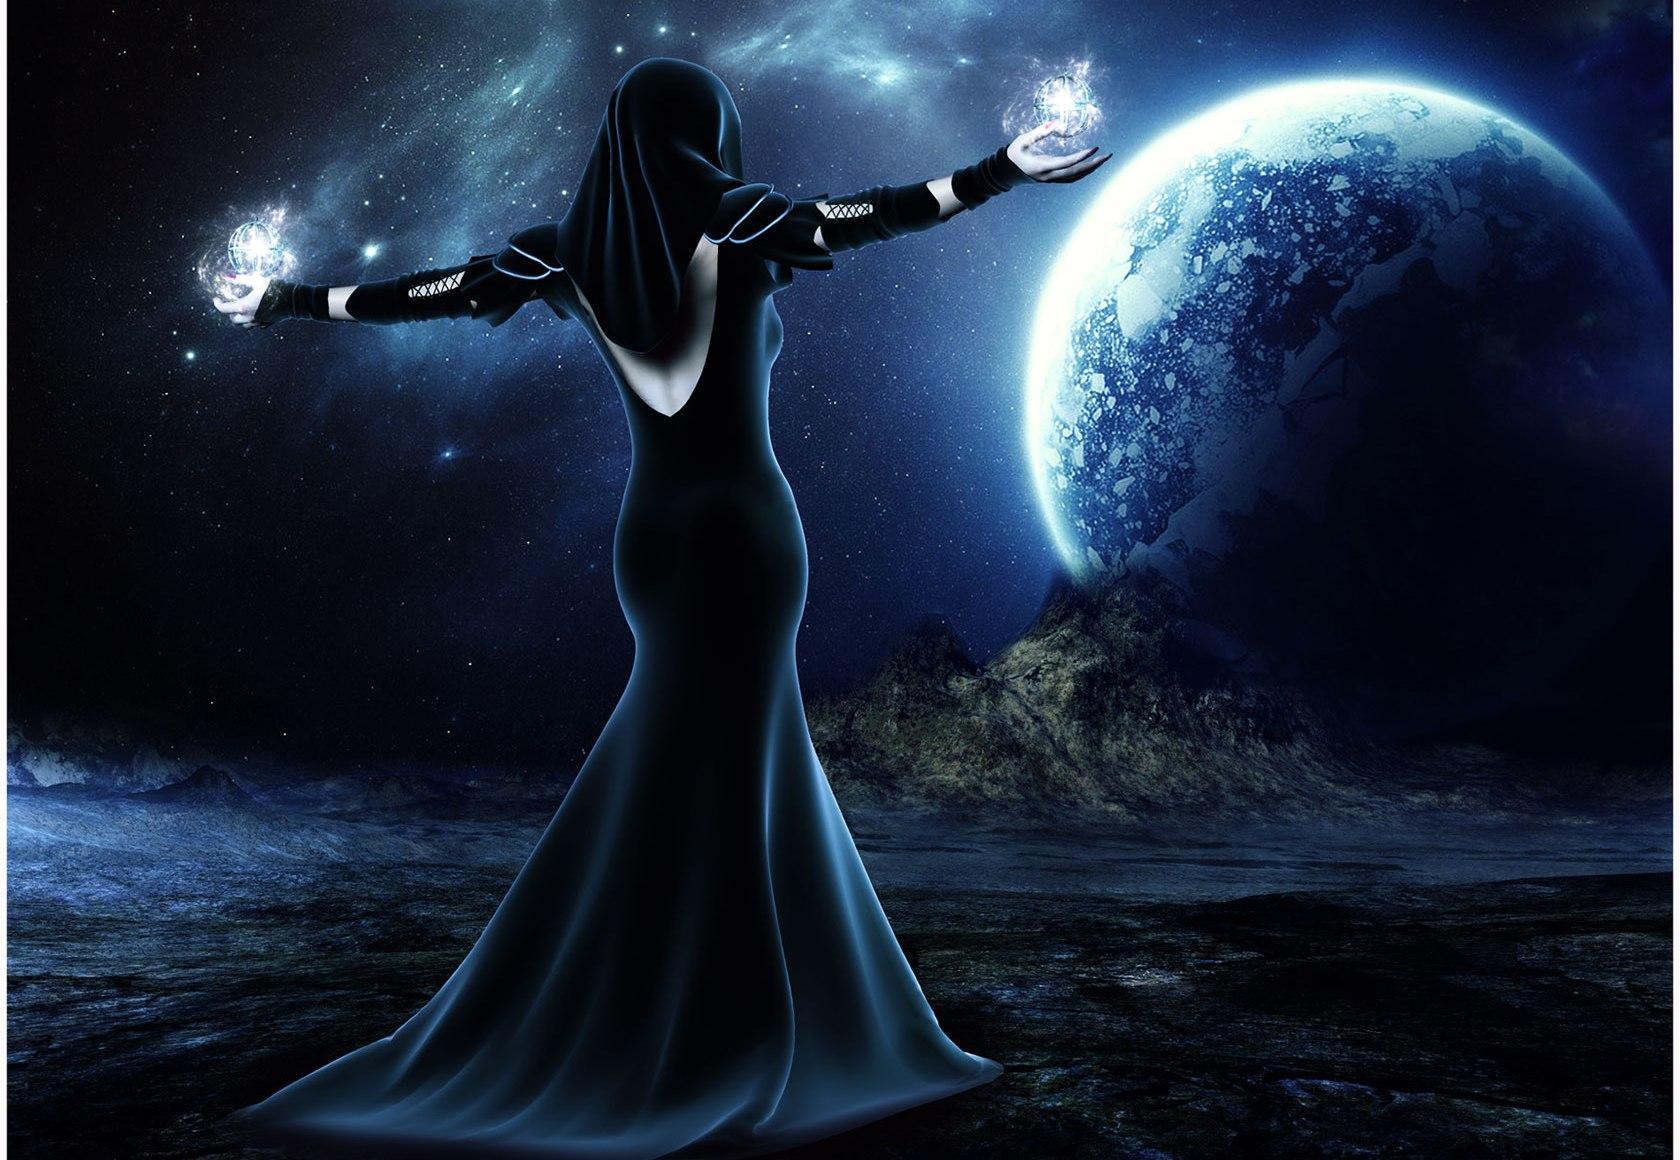 Image sorcery Gothic Fantasy Girls Fantasy